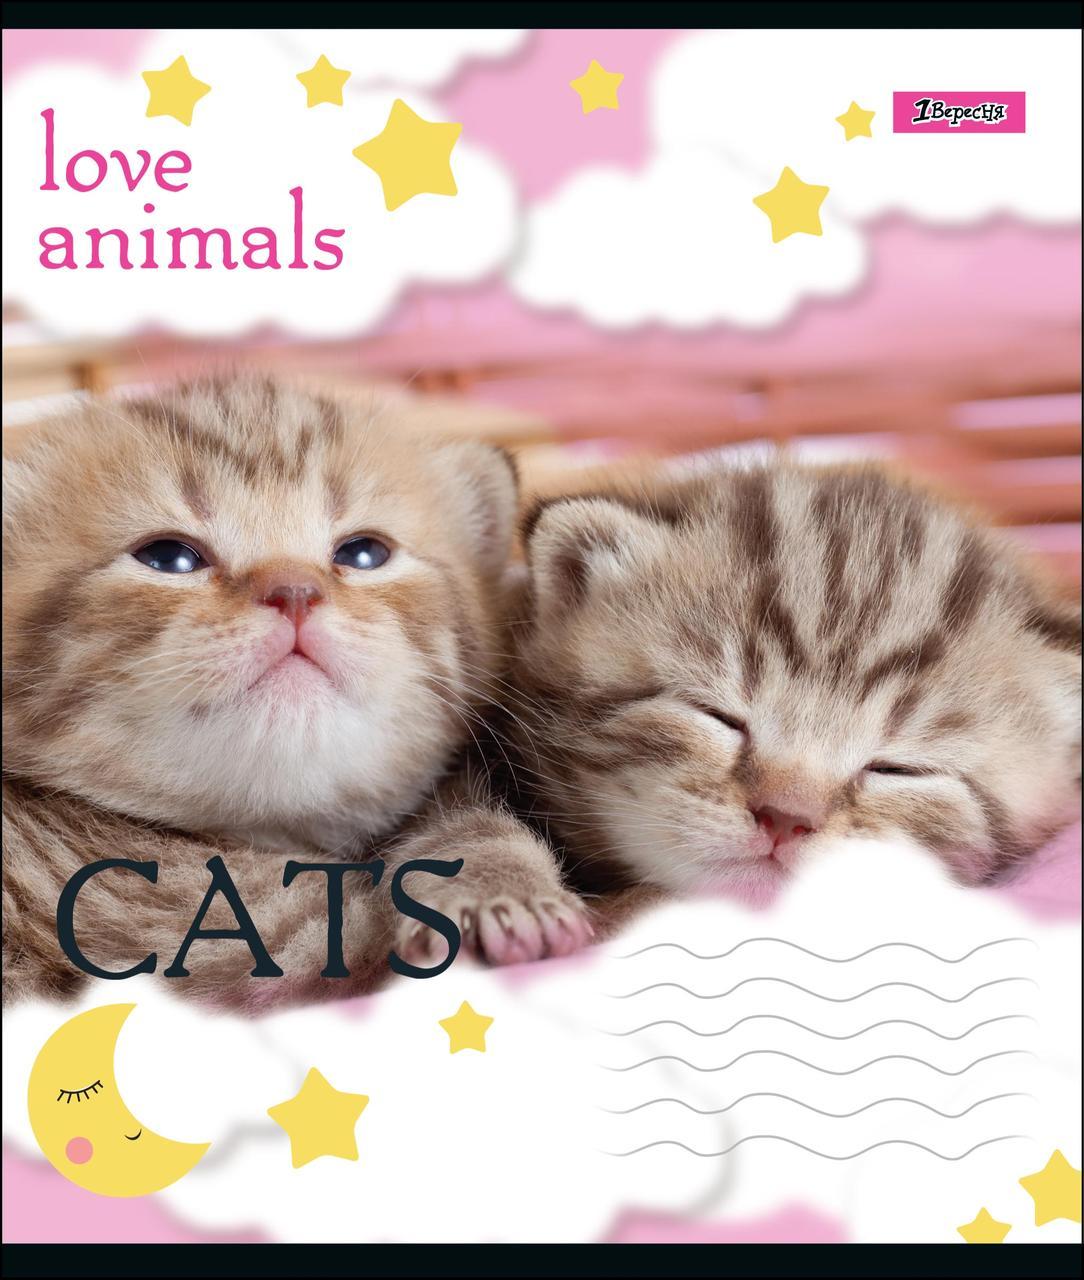 Тетрадь А5/12 лин. 1В LOVE ANIMALS, 25 шт/уп.